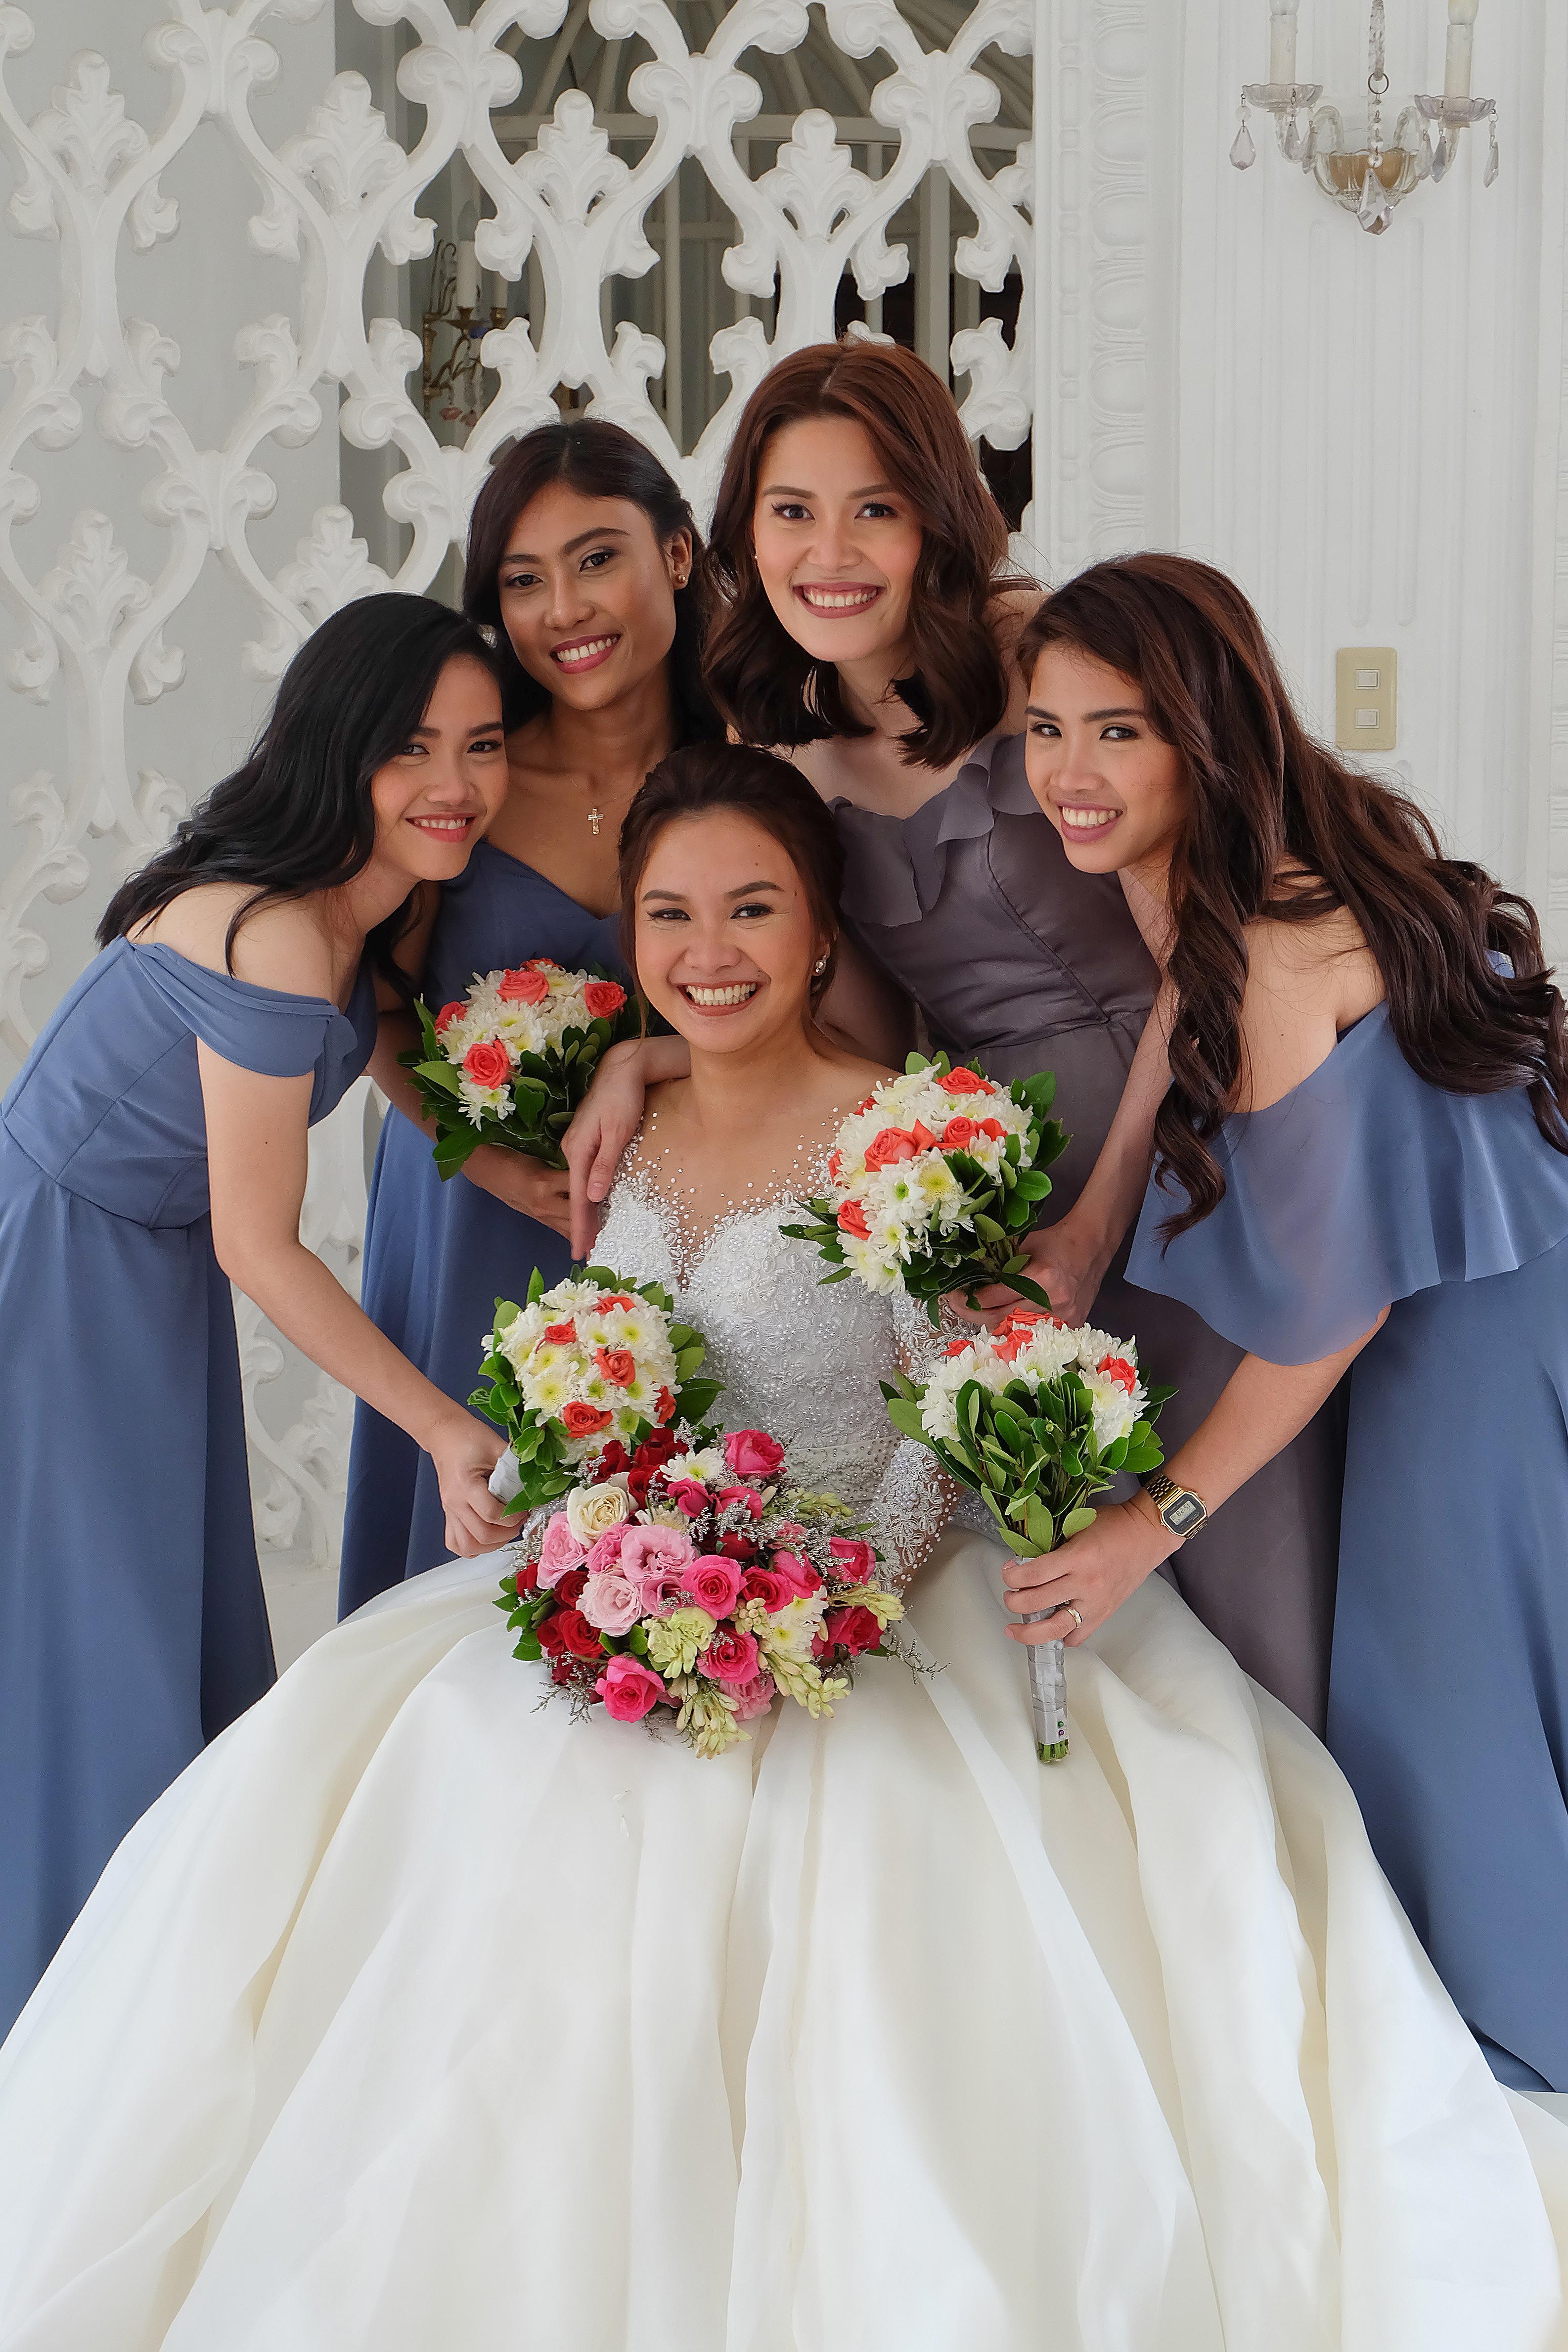 WEDDING ENTOURAGE SERVICE